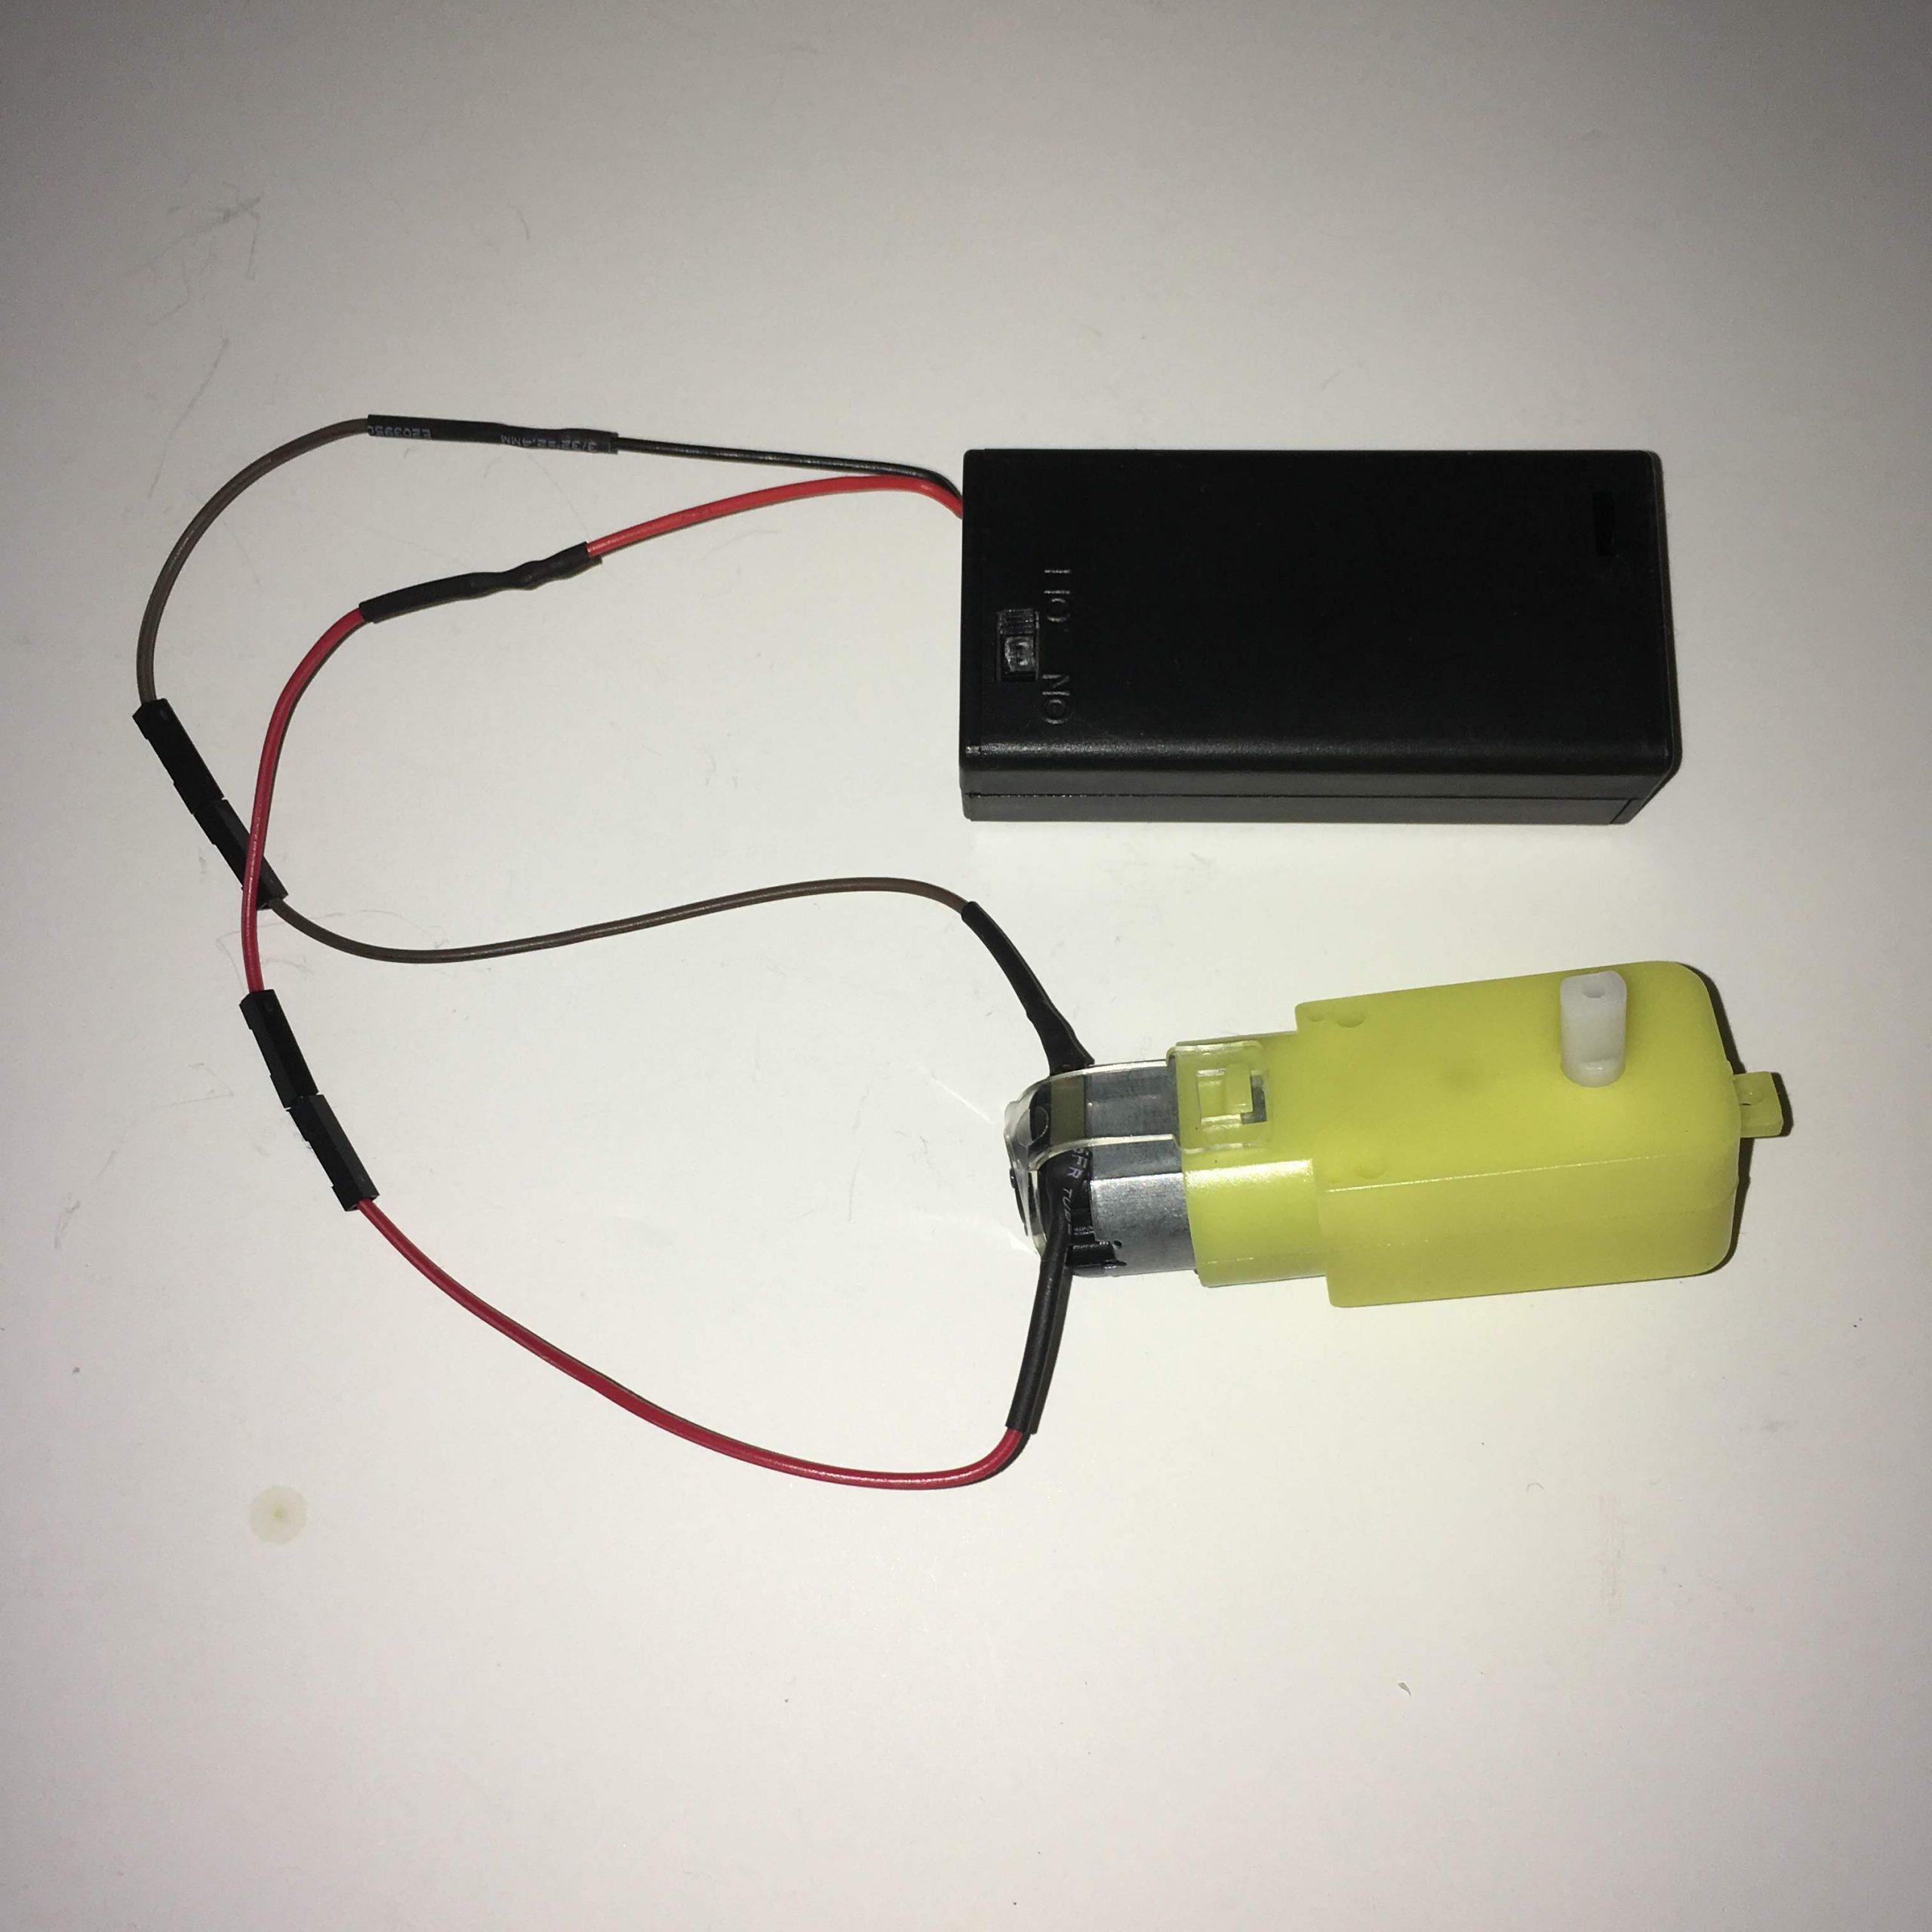 3V Redüktörlü Motor ve 2'li AA Pil Yuvası (Kapaklı ve Switchli)